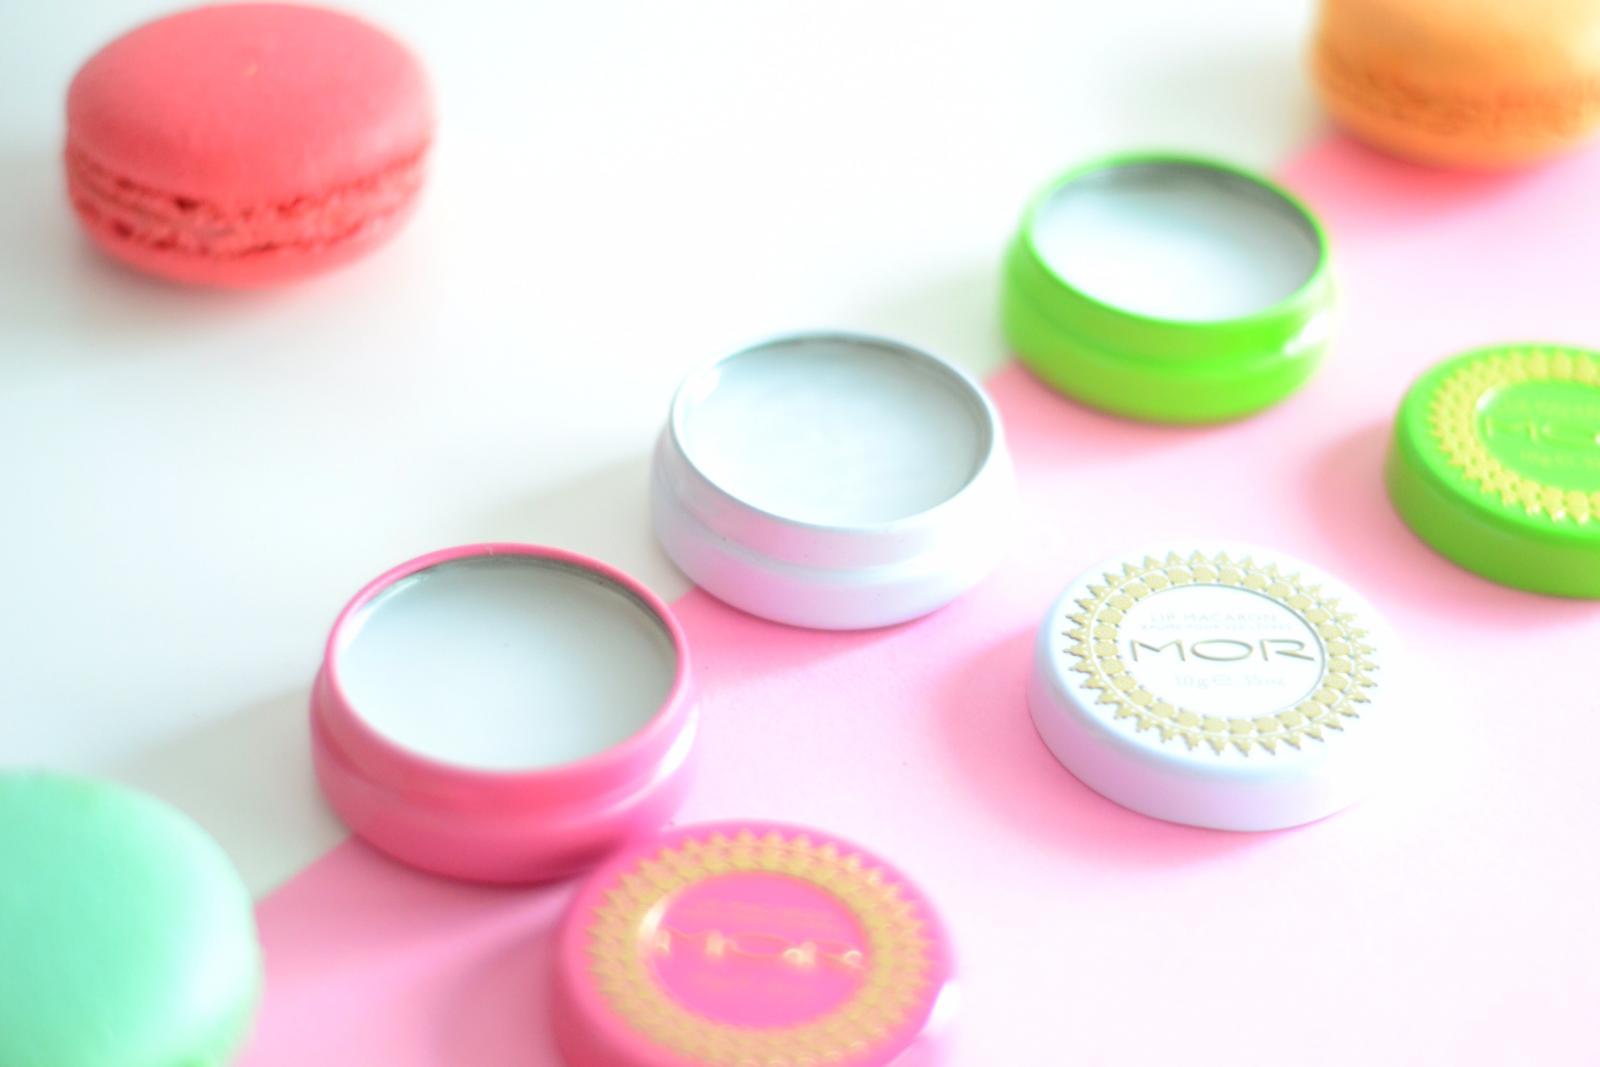 mor-lip-macarons-formula